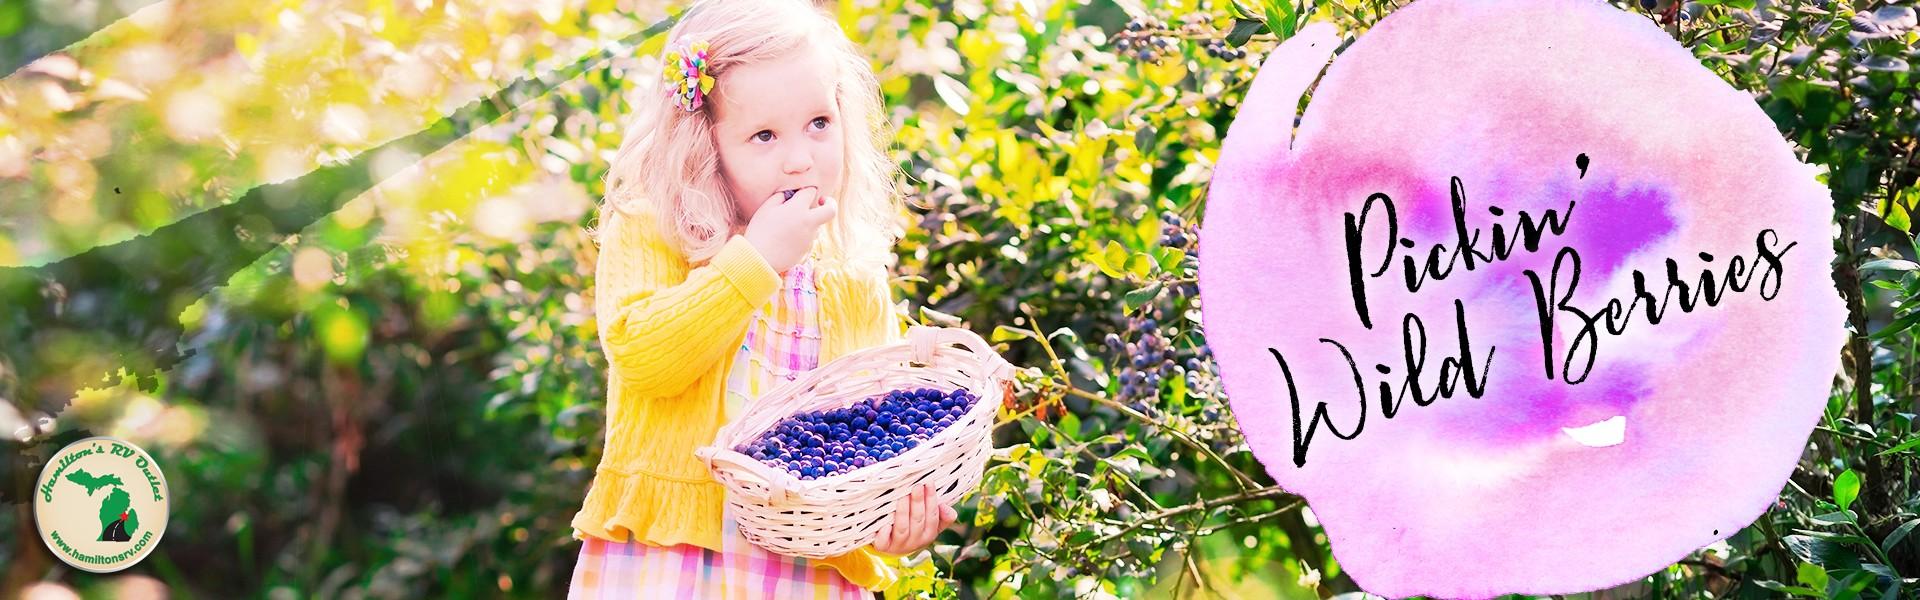 Young girl pickin' wild berries